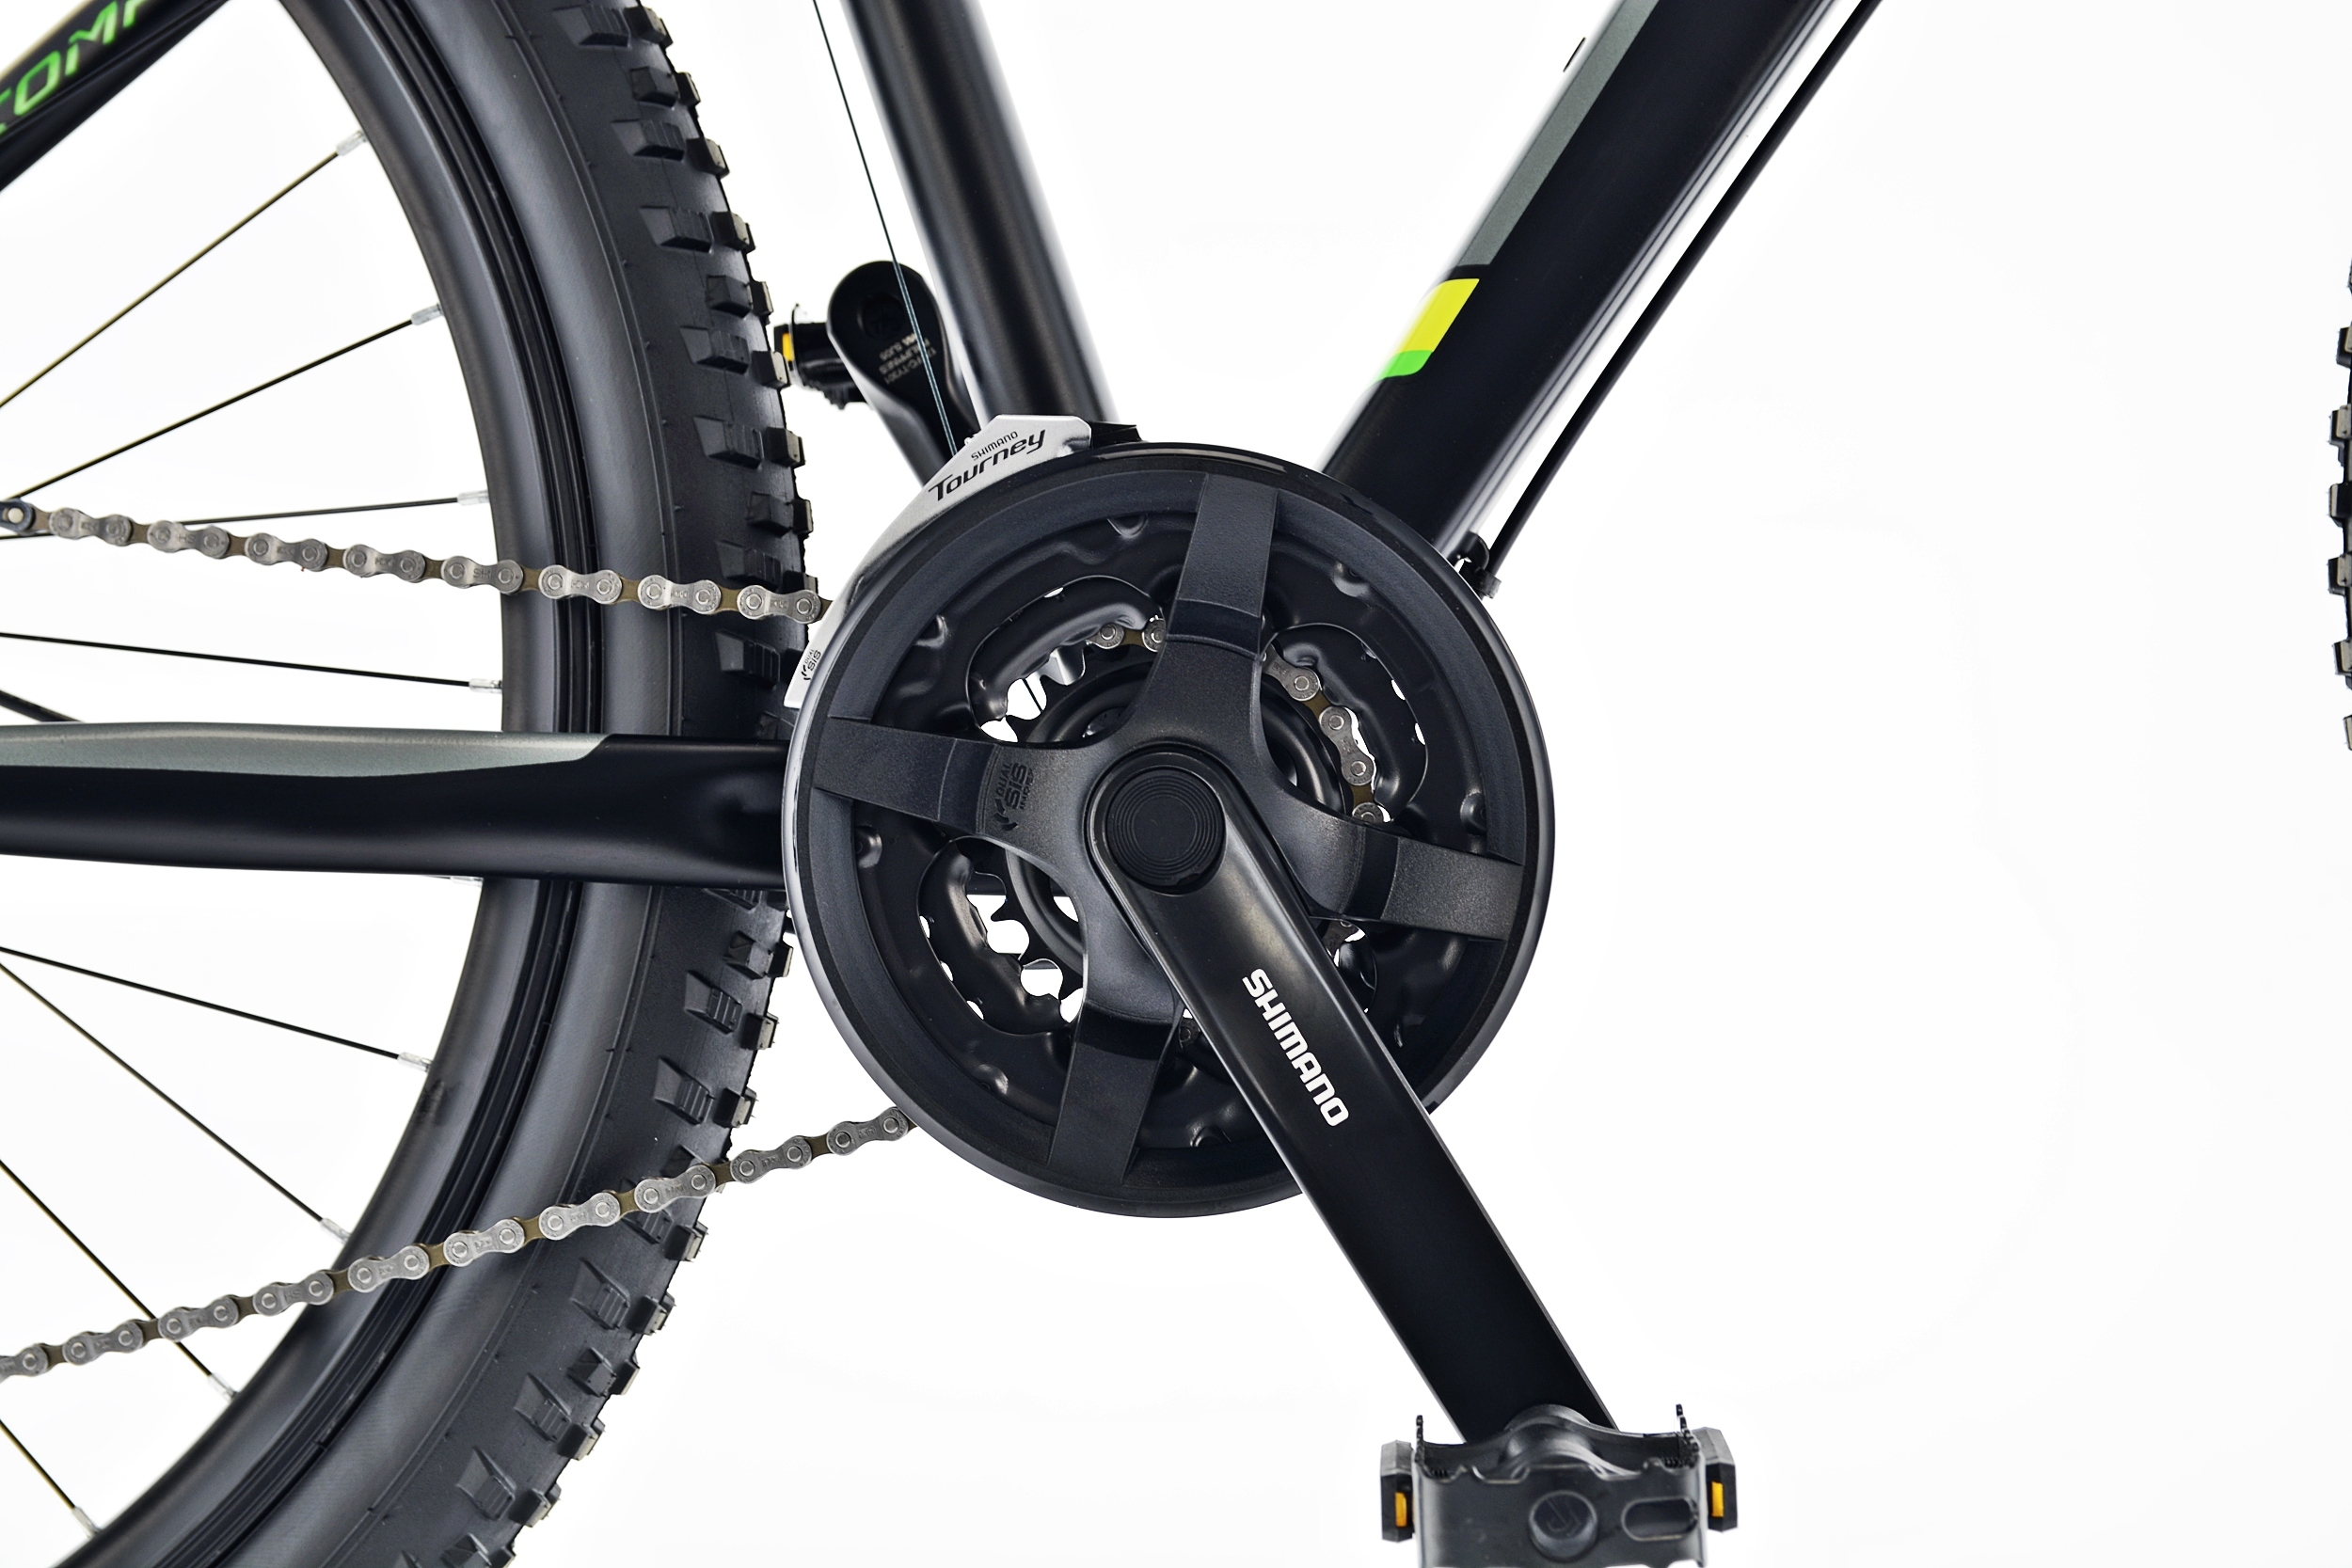 Rower MTB Kands 29 COMPER 21 czarno-seled 2021 Waga 15.4 kg